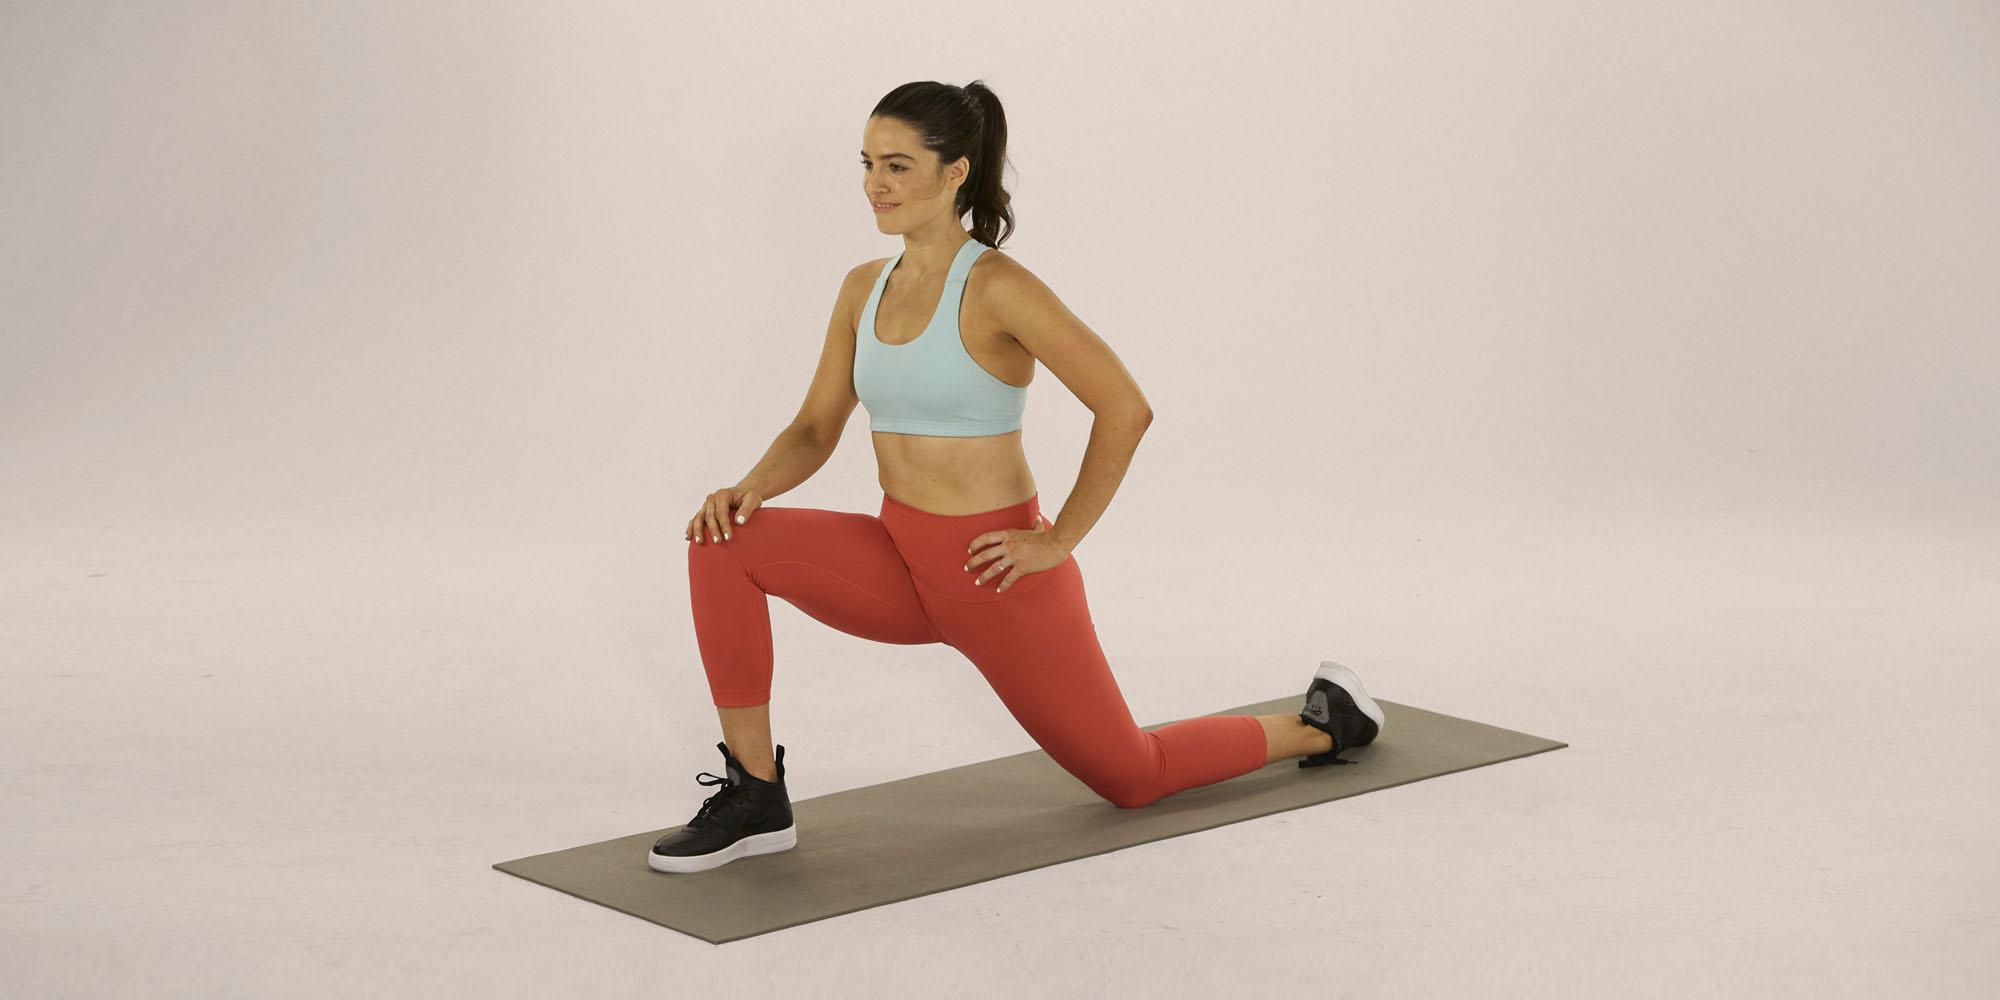 14 Exercises for Lower Back Pain